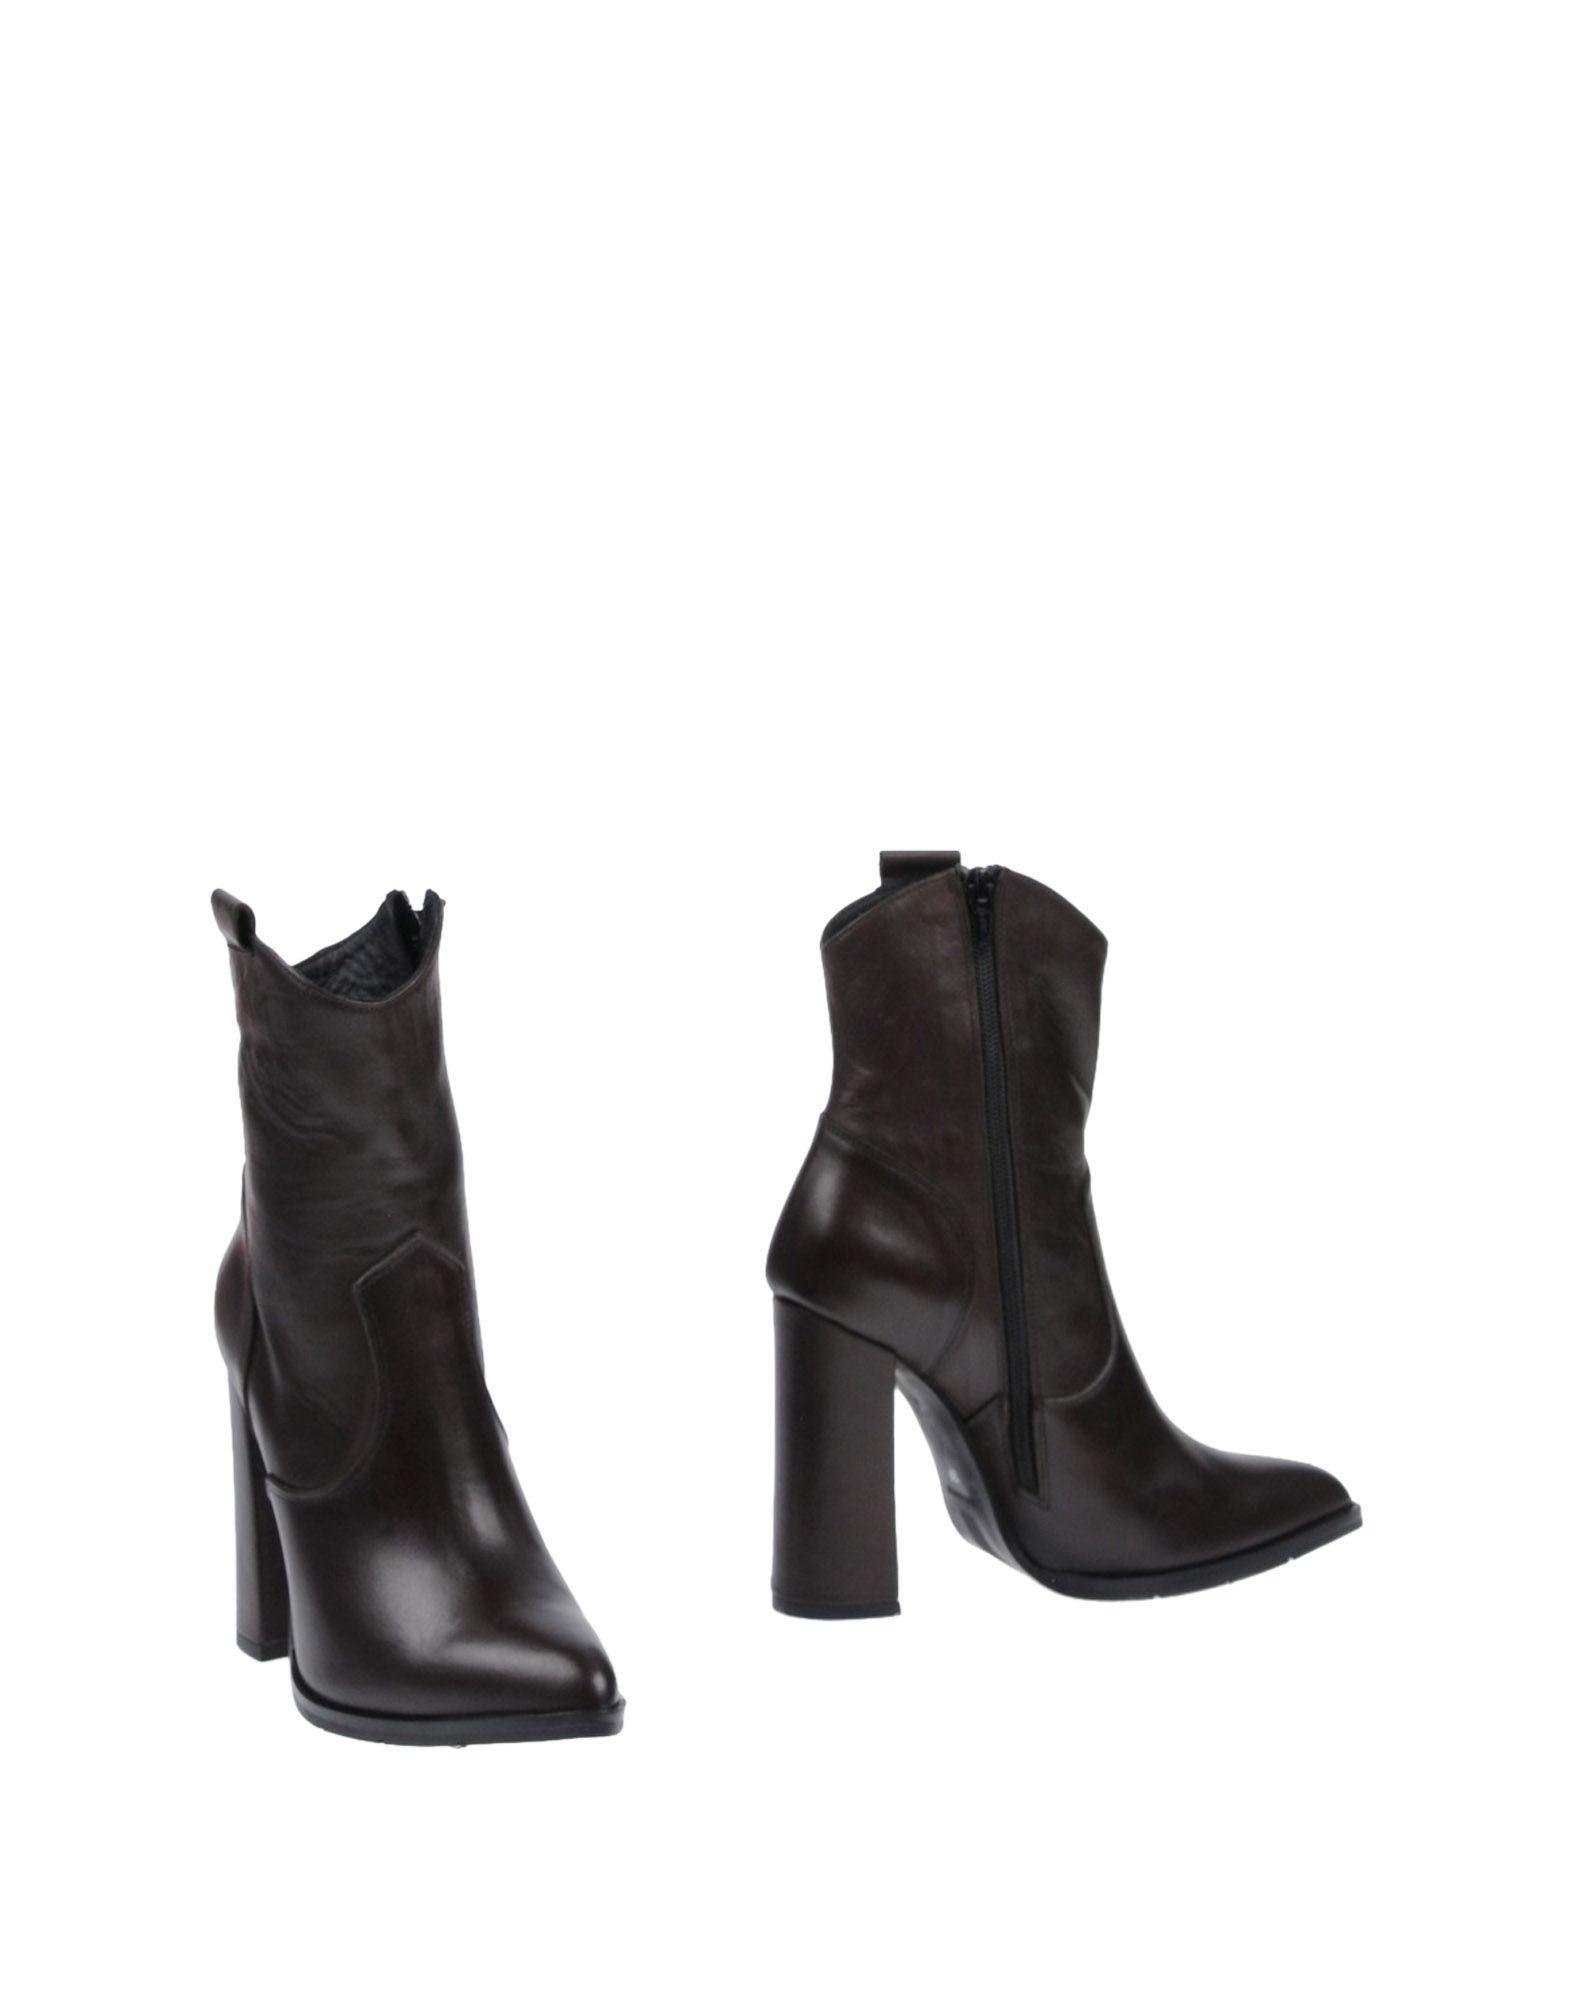 Silvian Heach Stiefelette Damen  11456402QP Gute Qualität beliebte Schuhe